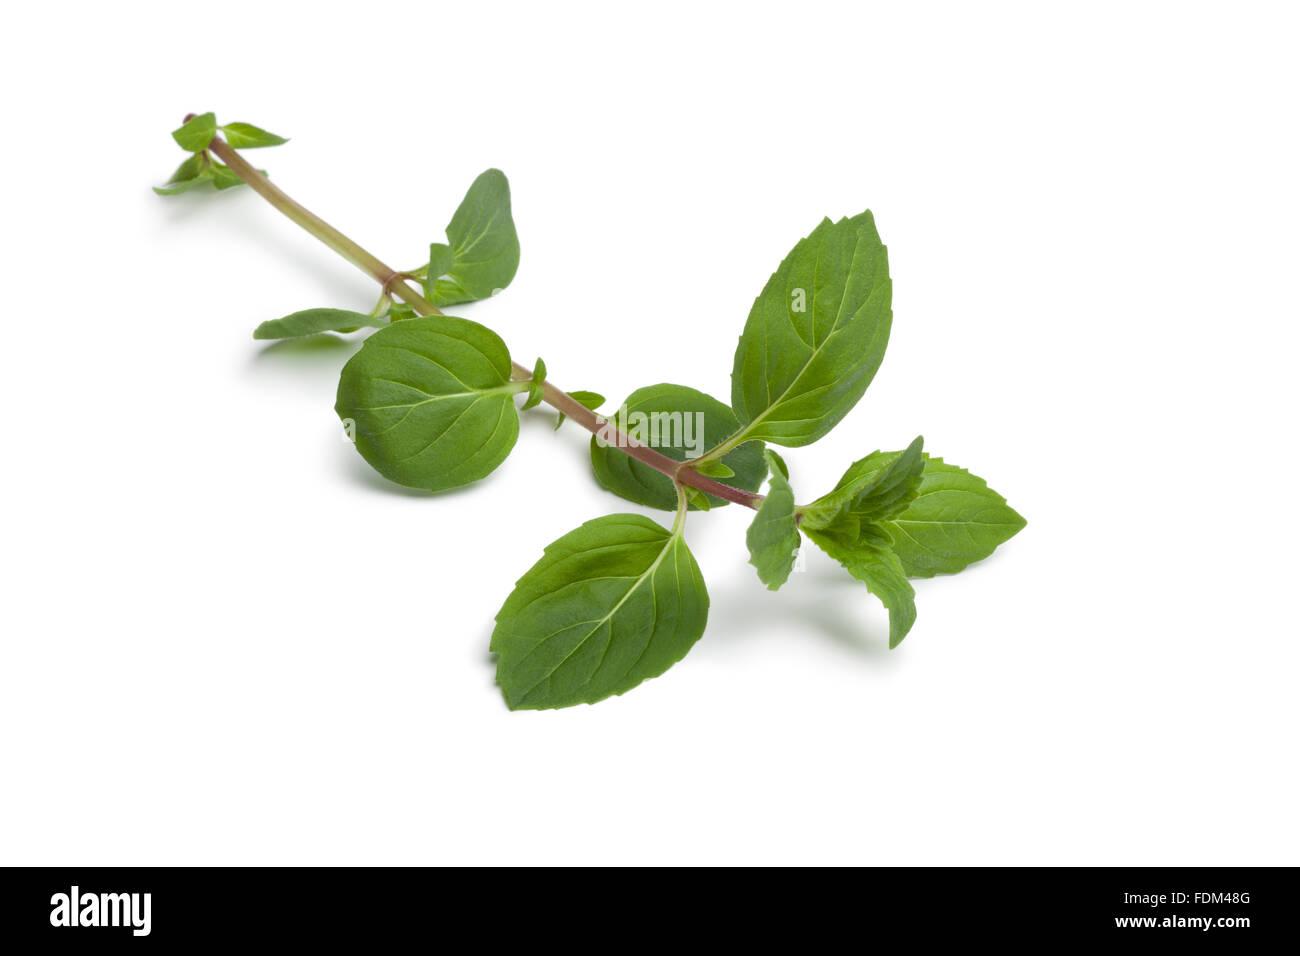 Twig of fresh ginger-mint plant on white background - Stock Image